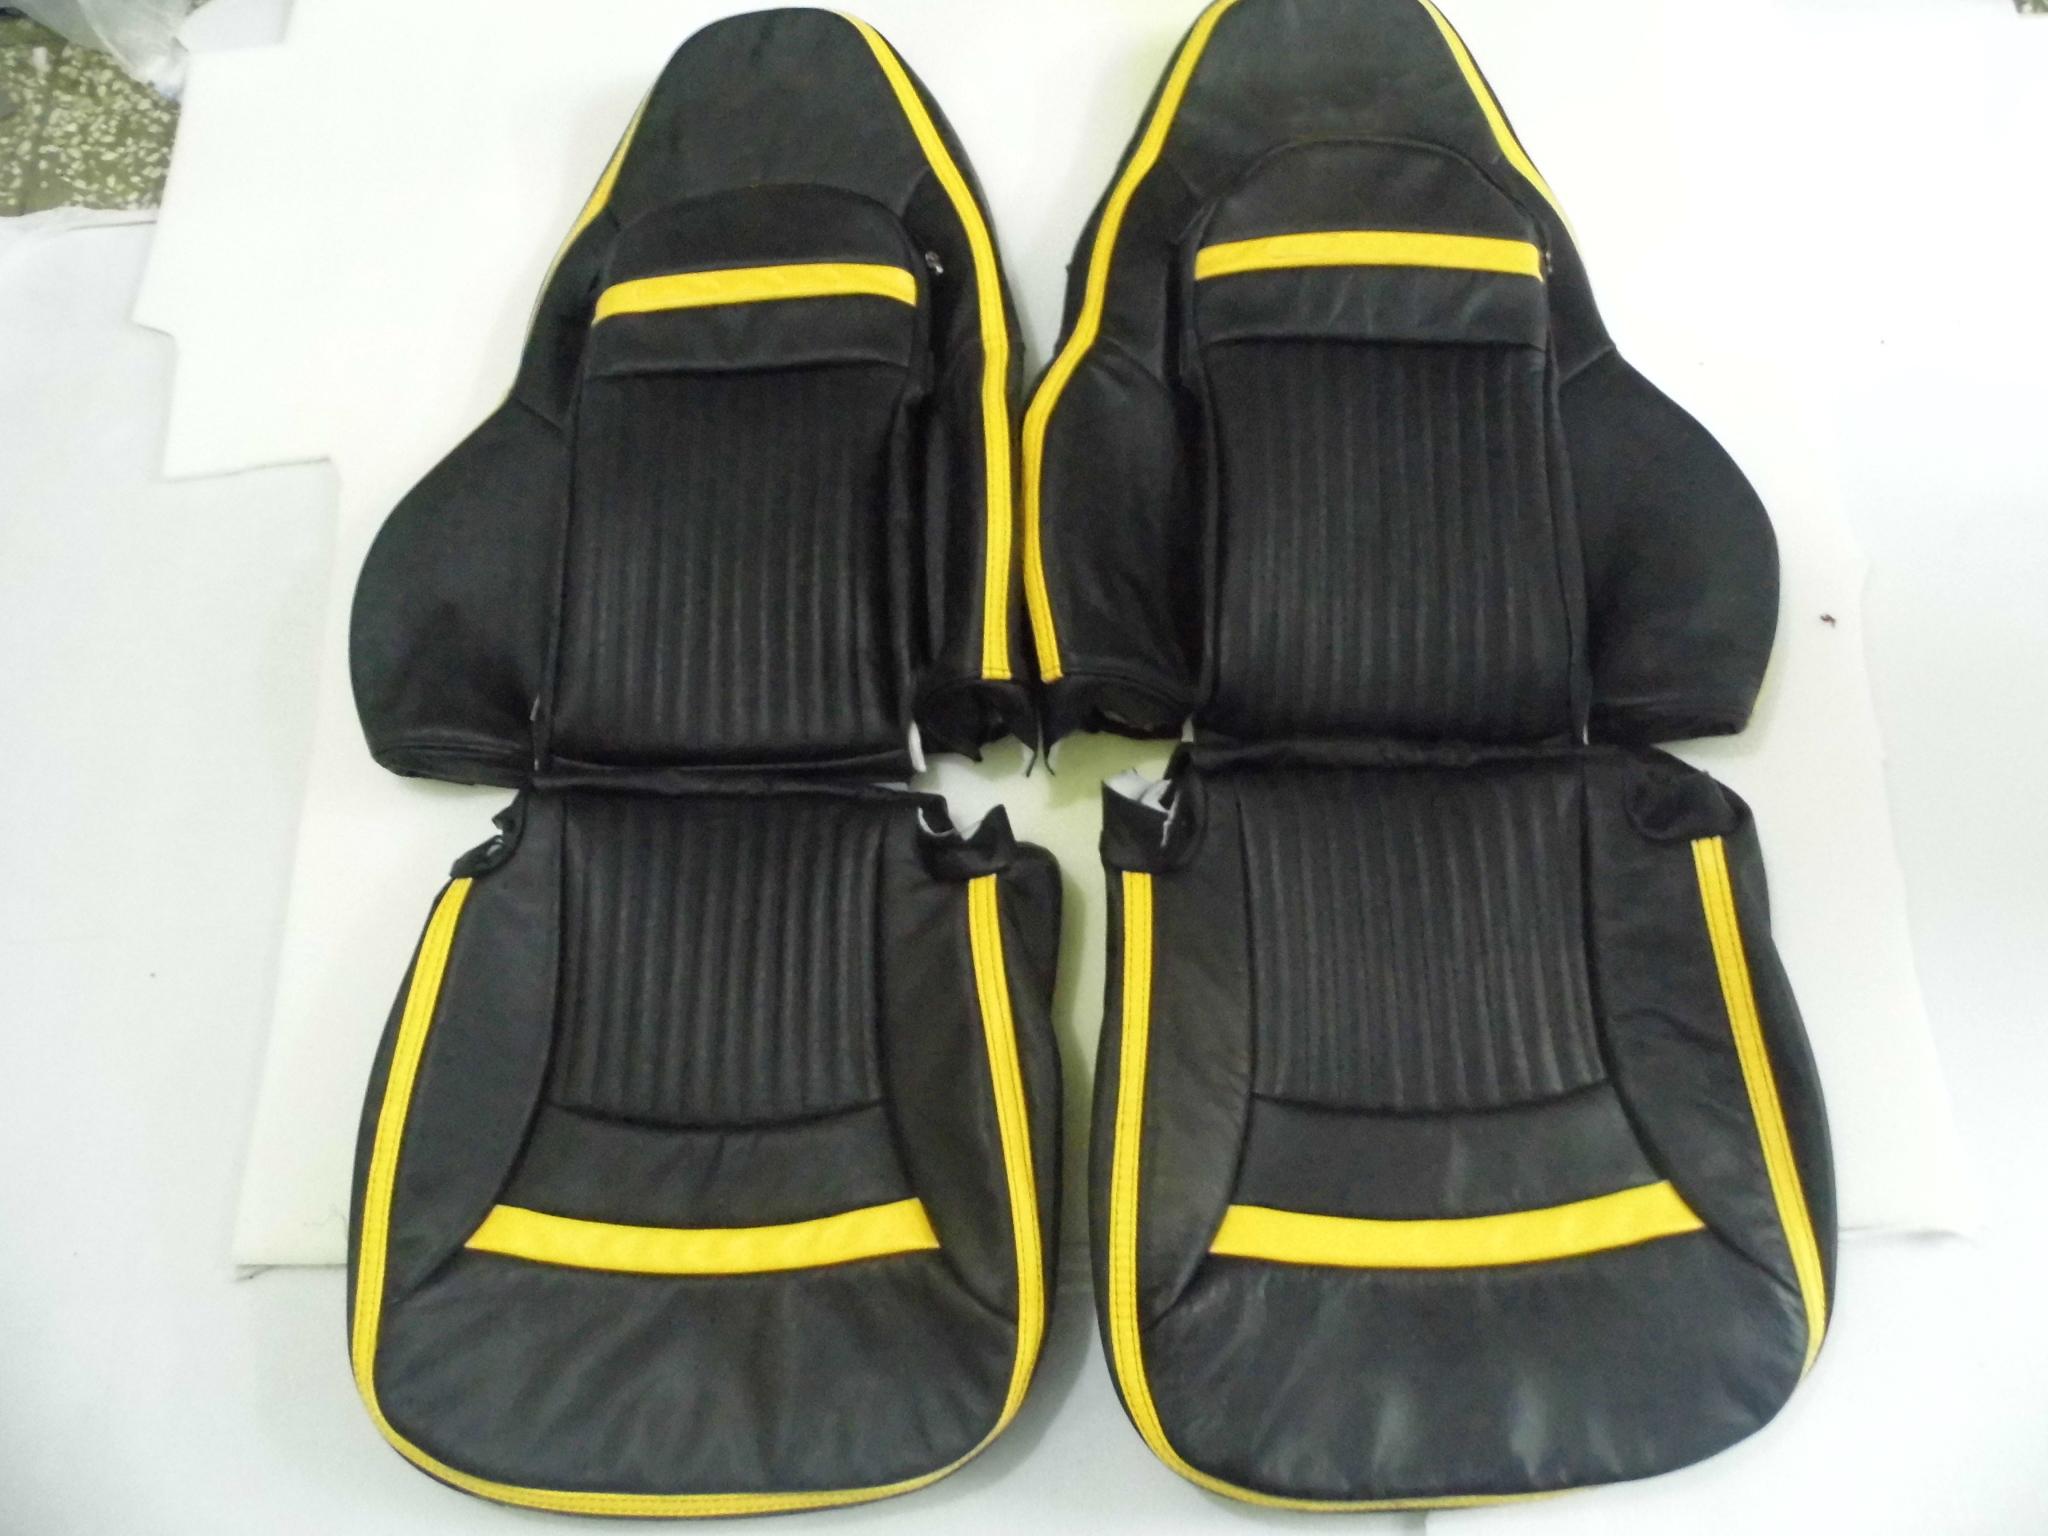 Prime 1997 2004 C5 Corvette Seat Covers Black Yellow Strip Lamtechconsult Wood Chair Design Ideas Lamtechconsultcom